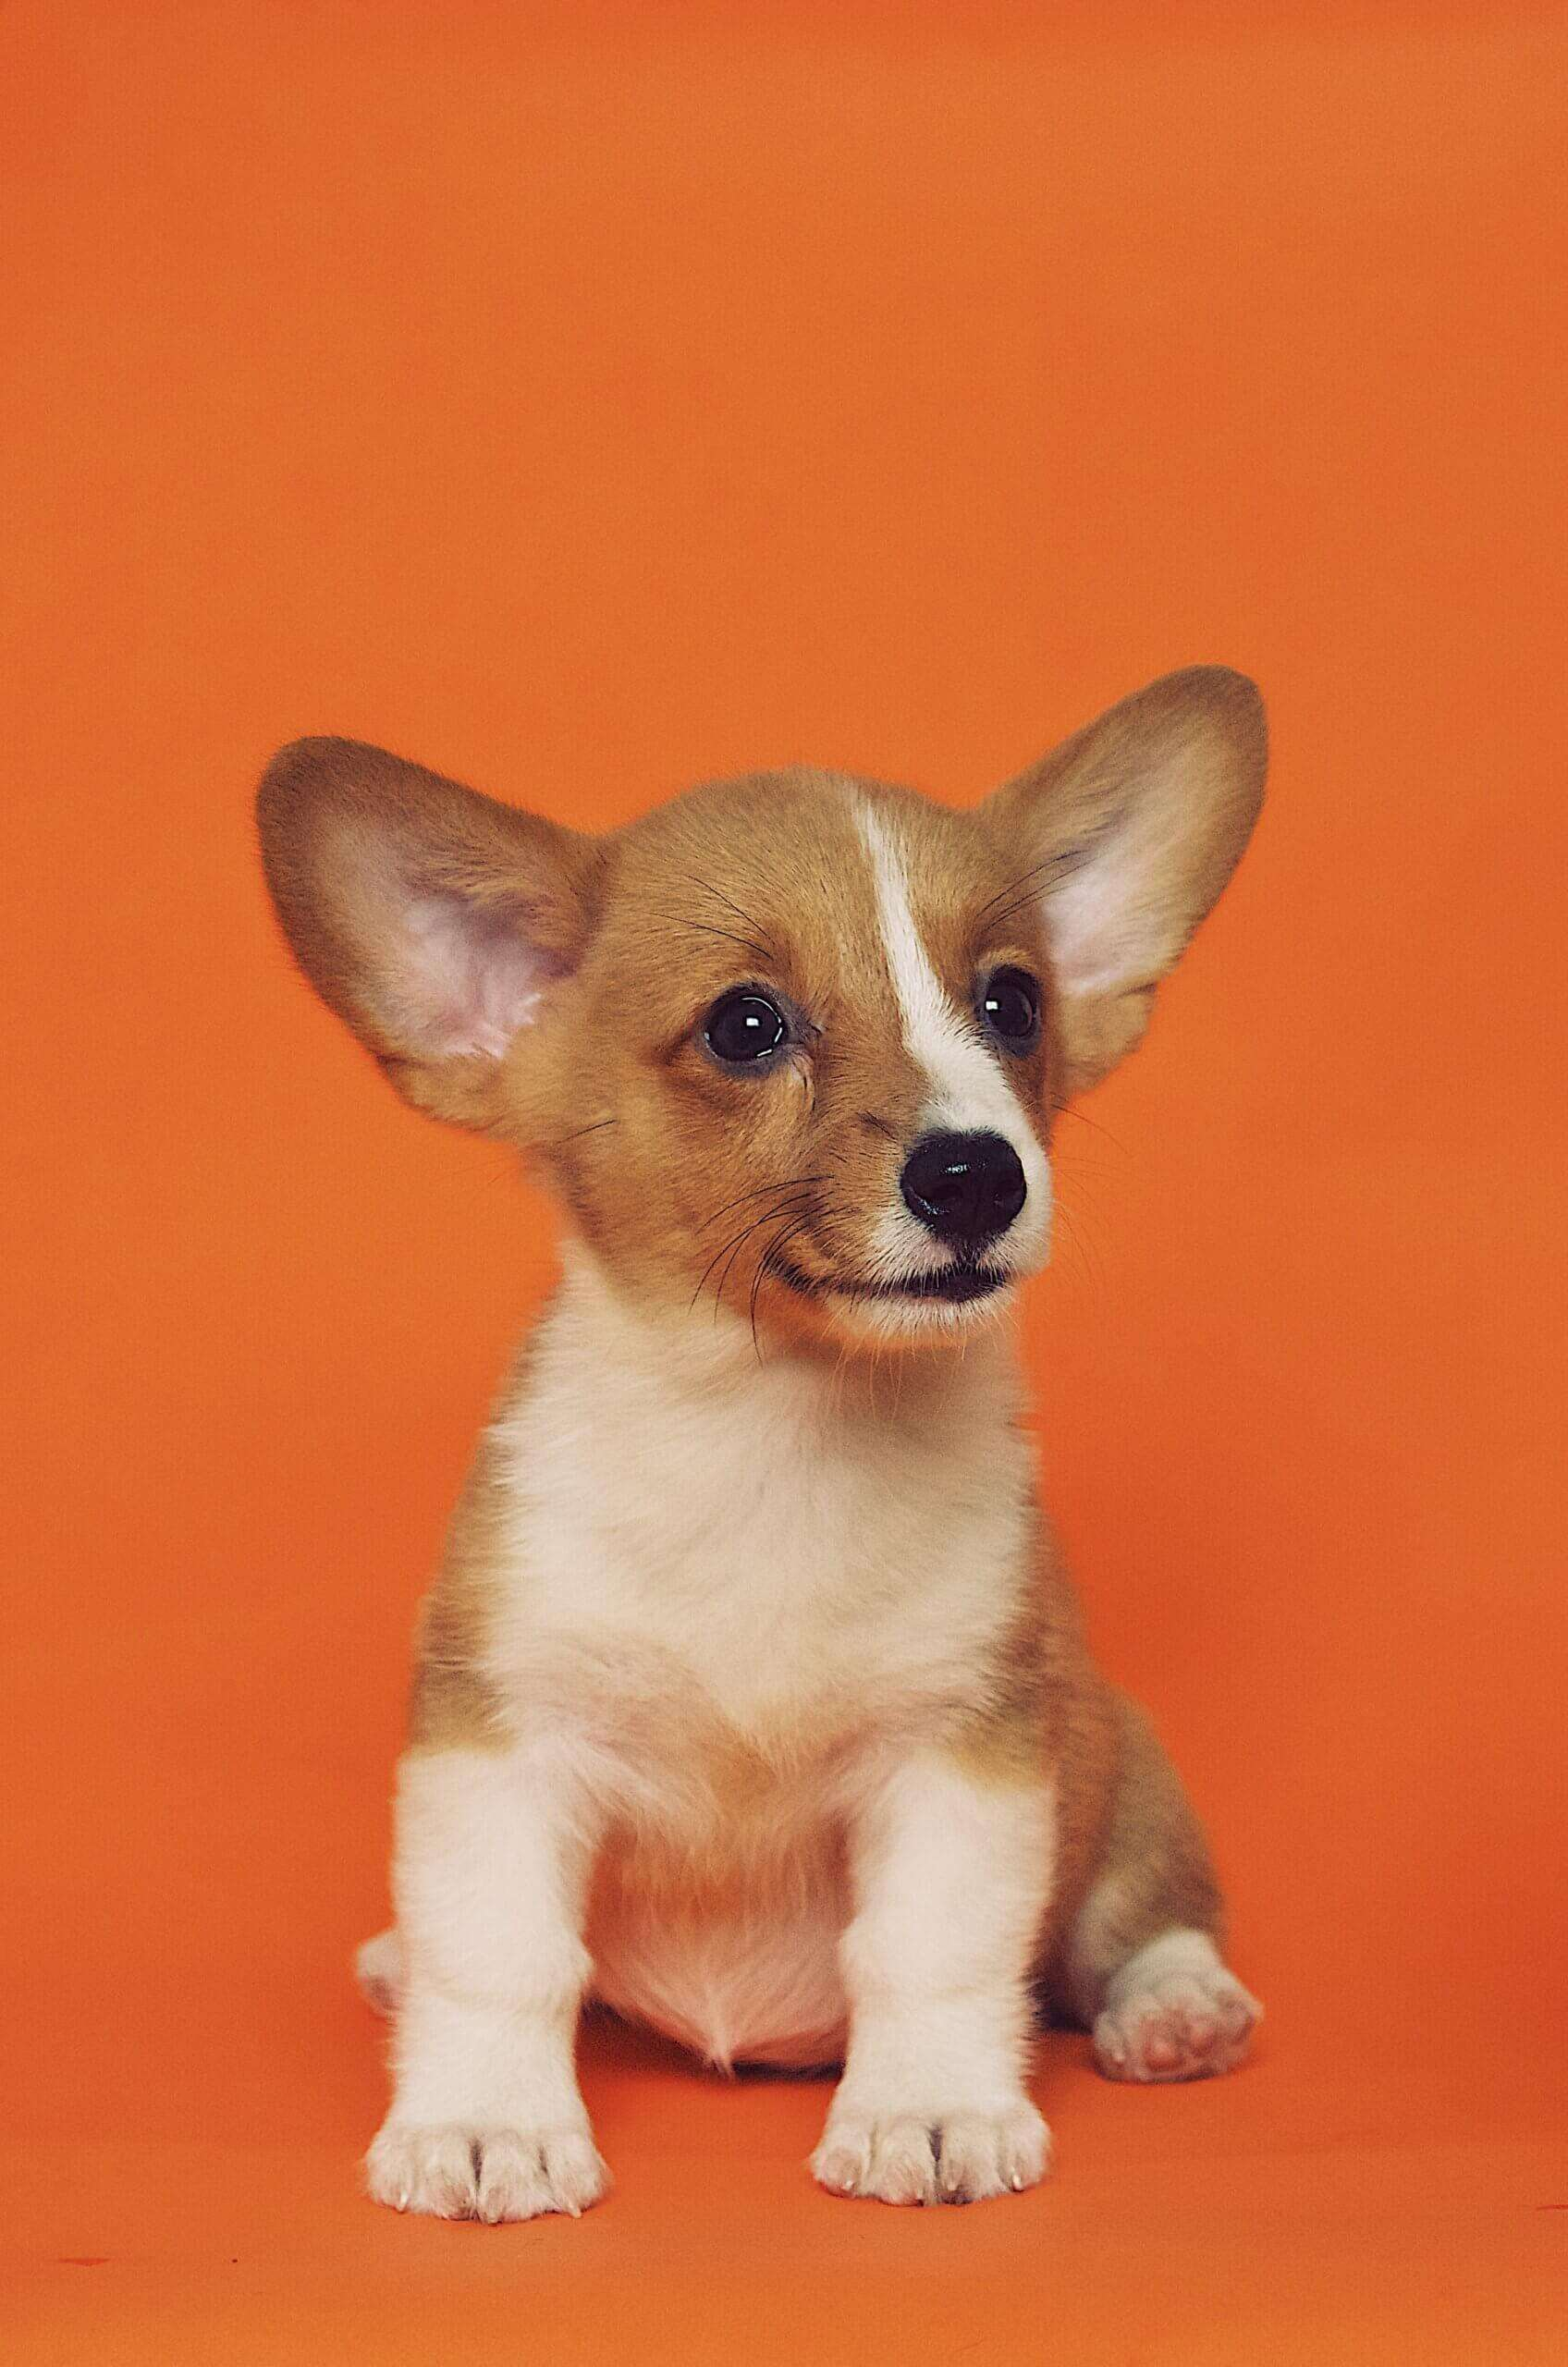 A dog on an orange background